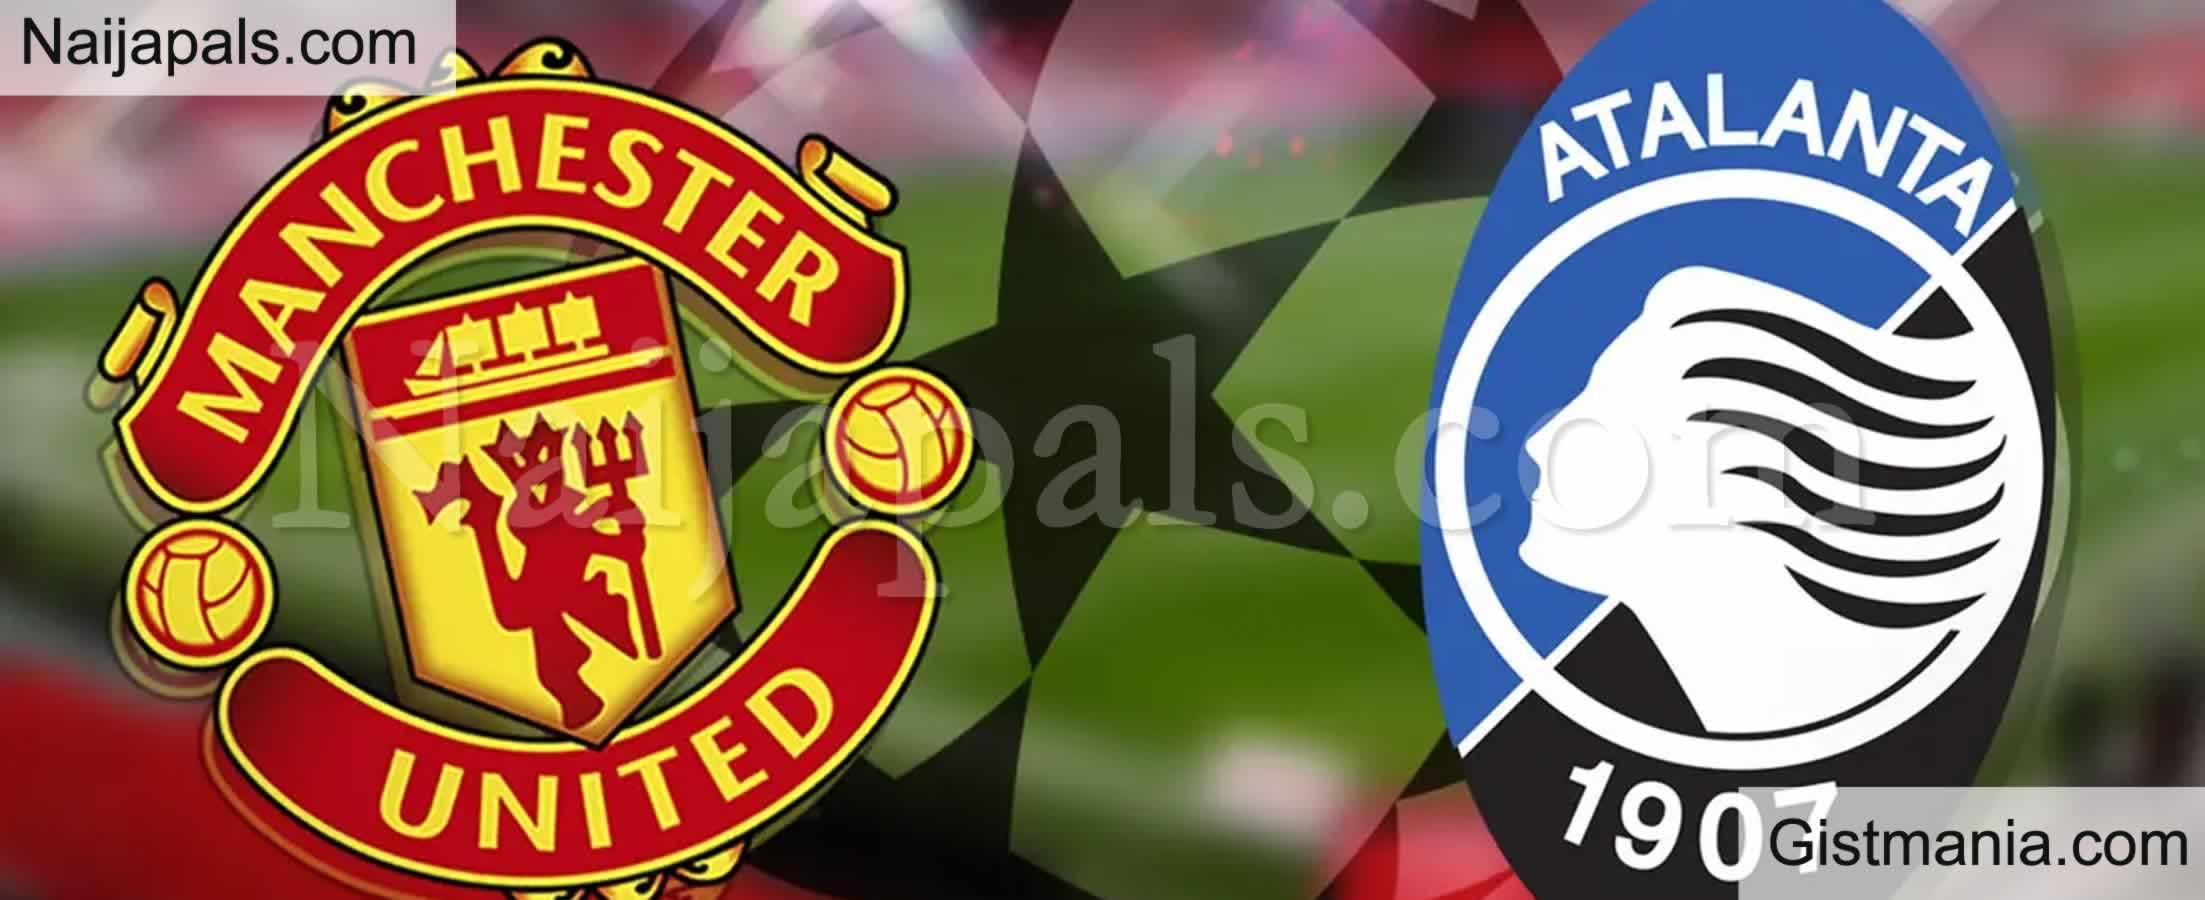 <img alt='.' class='lazyload' data-src='https://img.gistmania.com/emot/soccer.gif' /> <b>Manchester United v Atalanta : UEFA Champion's League Match, Team News, Goal Scorers and Stats</b>